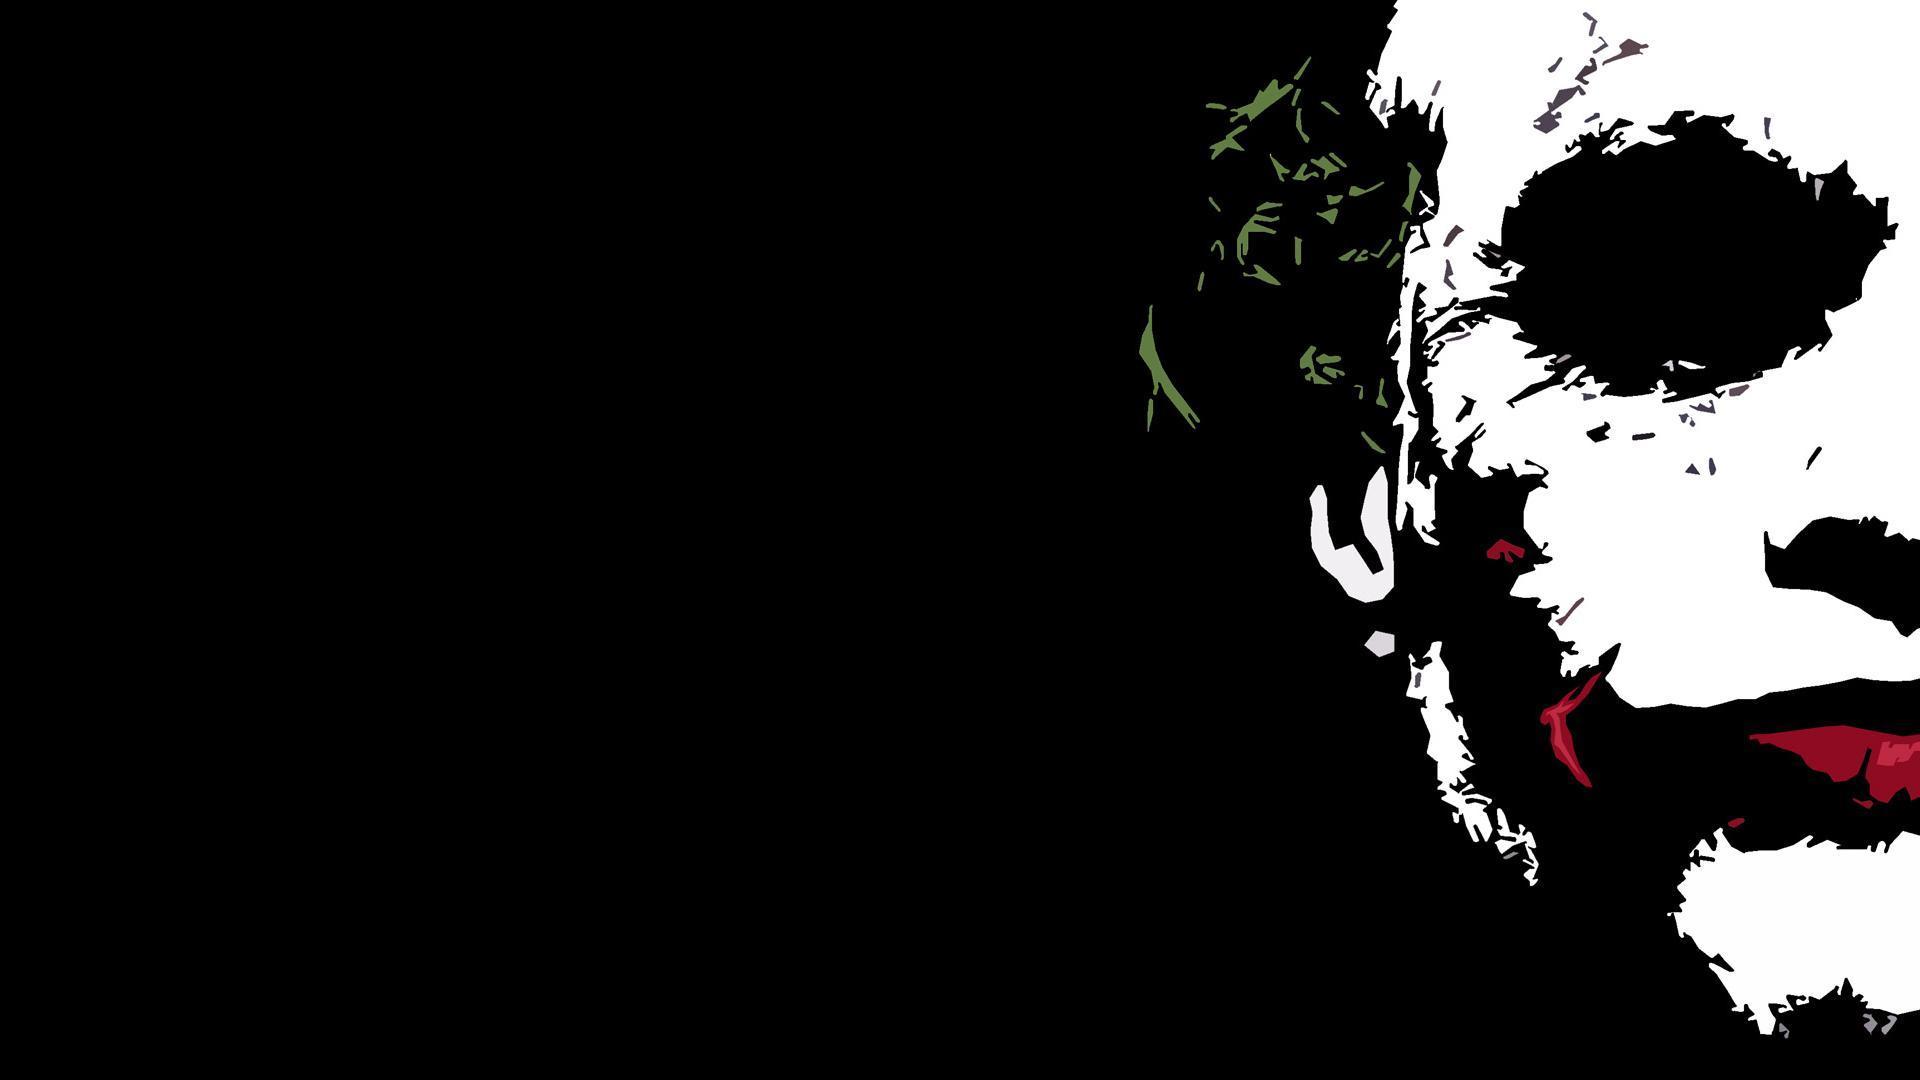 <b>Wallpaper</b> of the <b>Joker</b> - WallpaperSafari